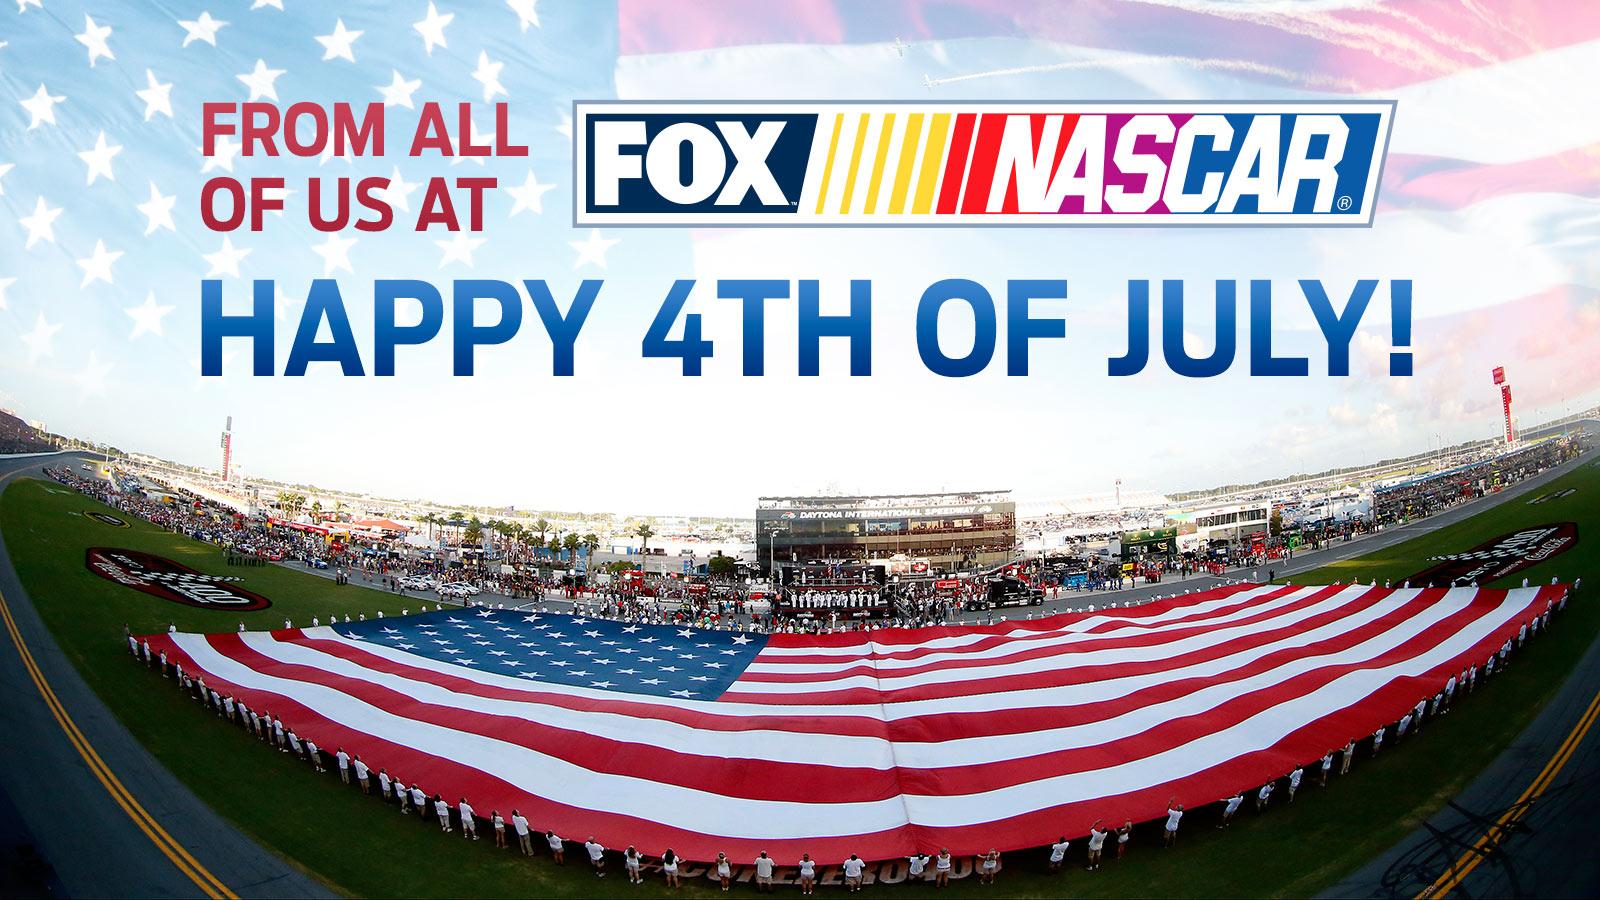 070415-NASCAR-happy-4th-of-july-2-ssm.jpg